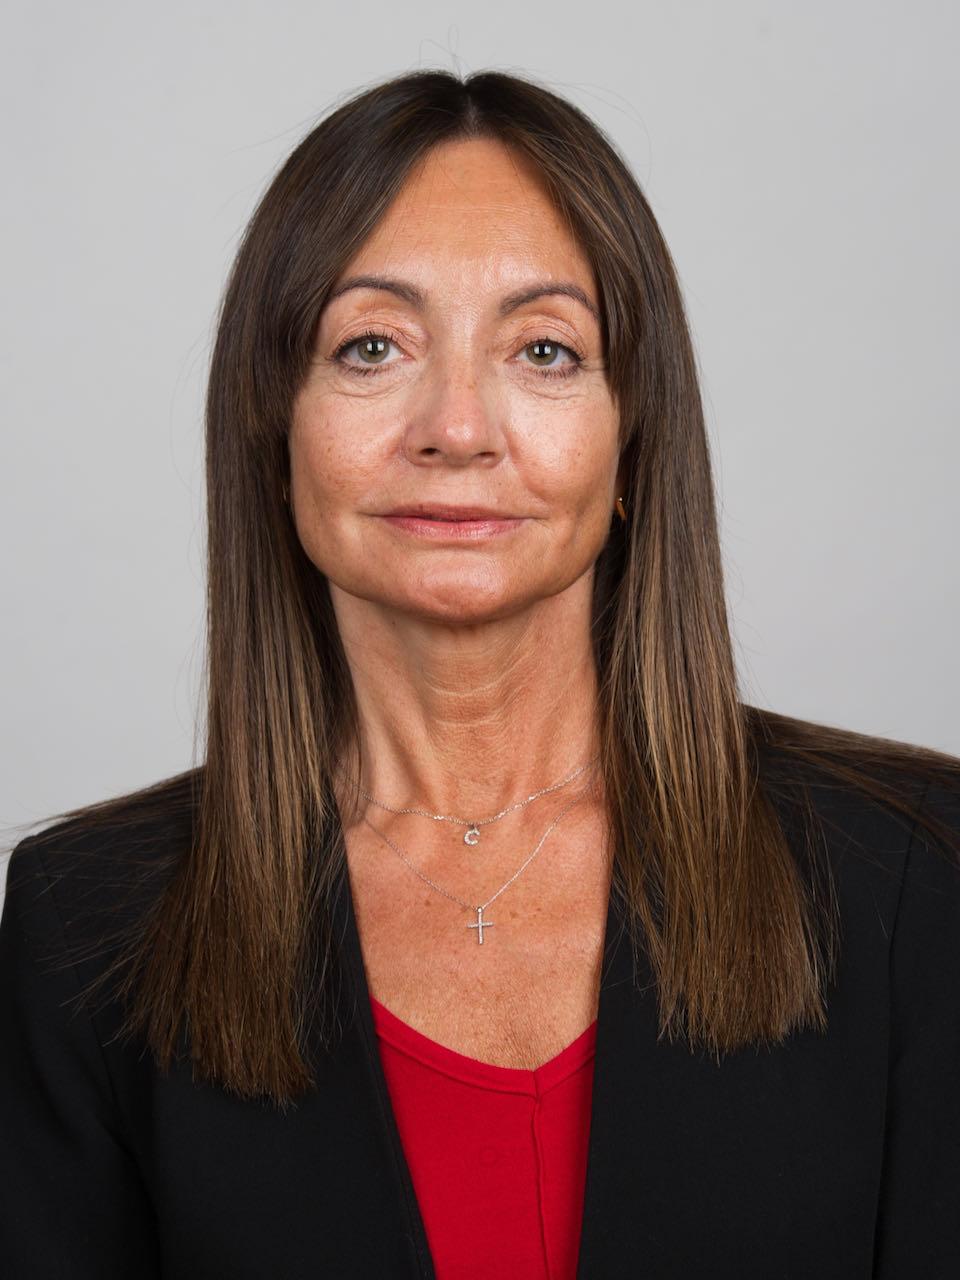 Sra. Carme Jiménez Villalba